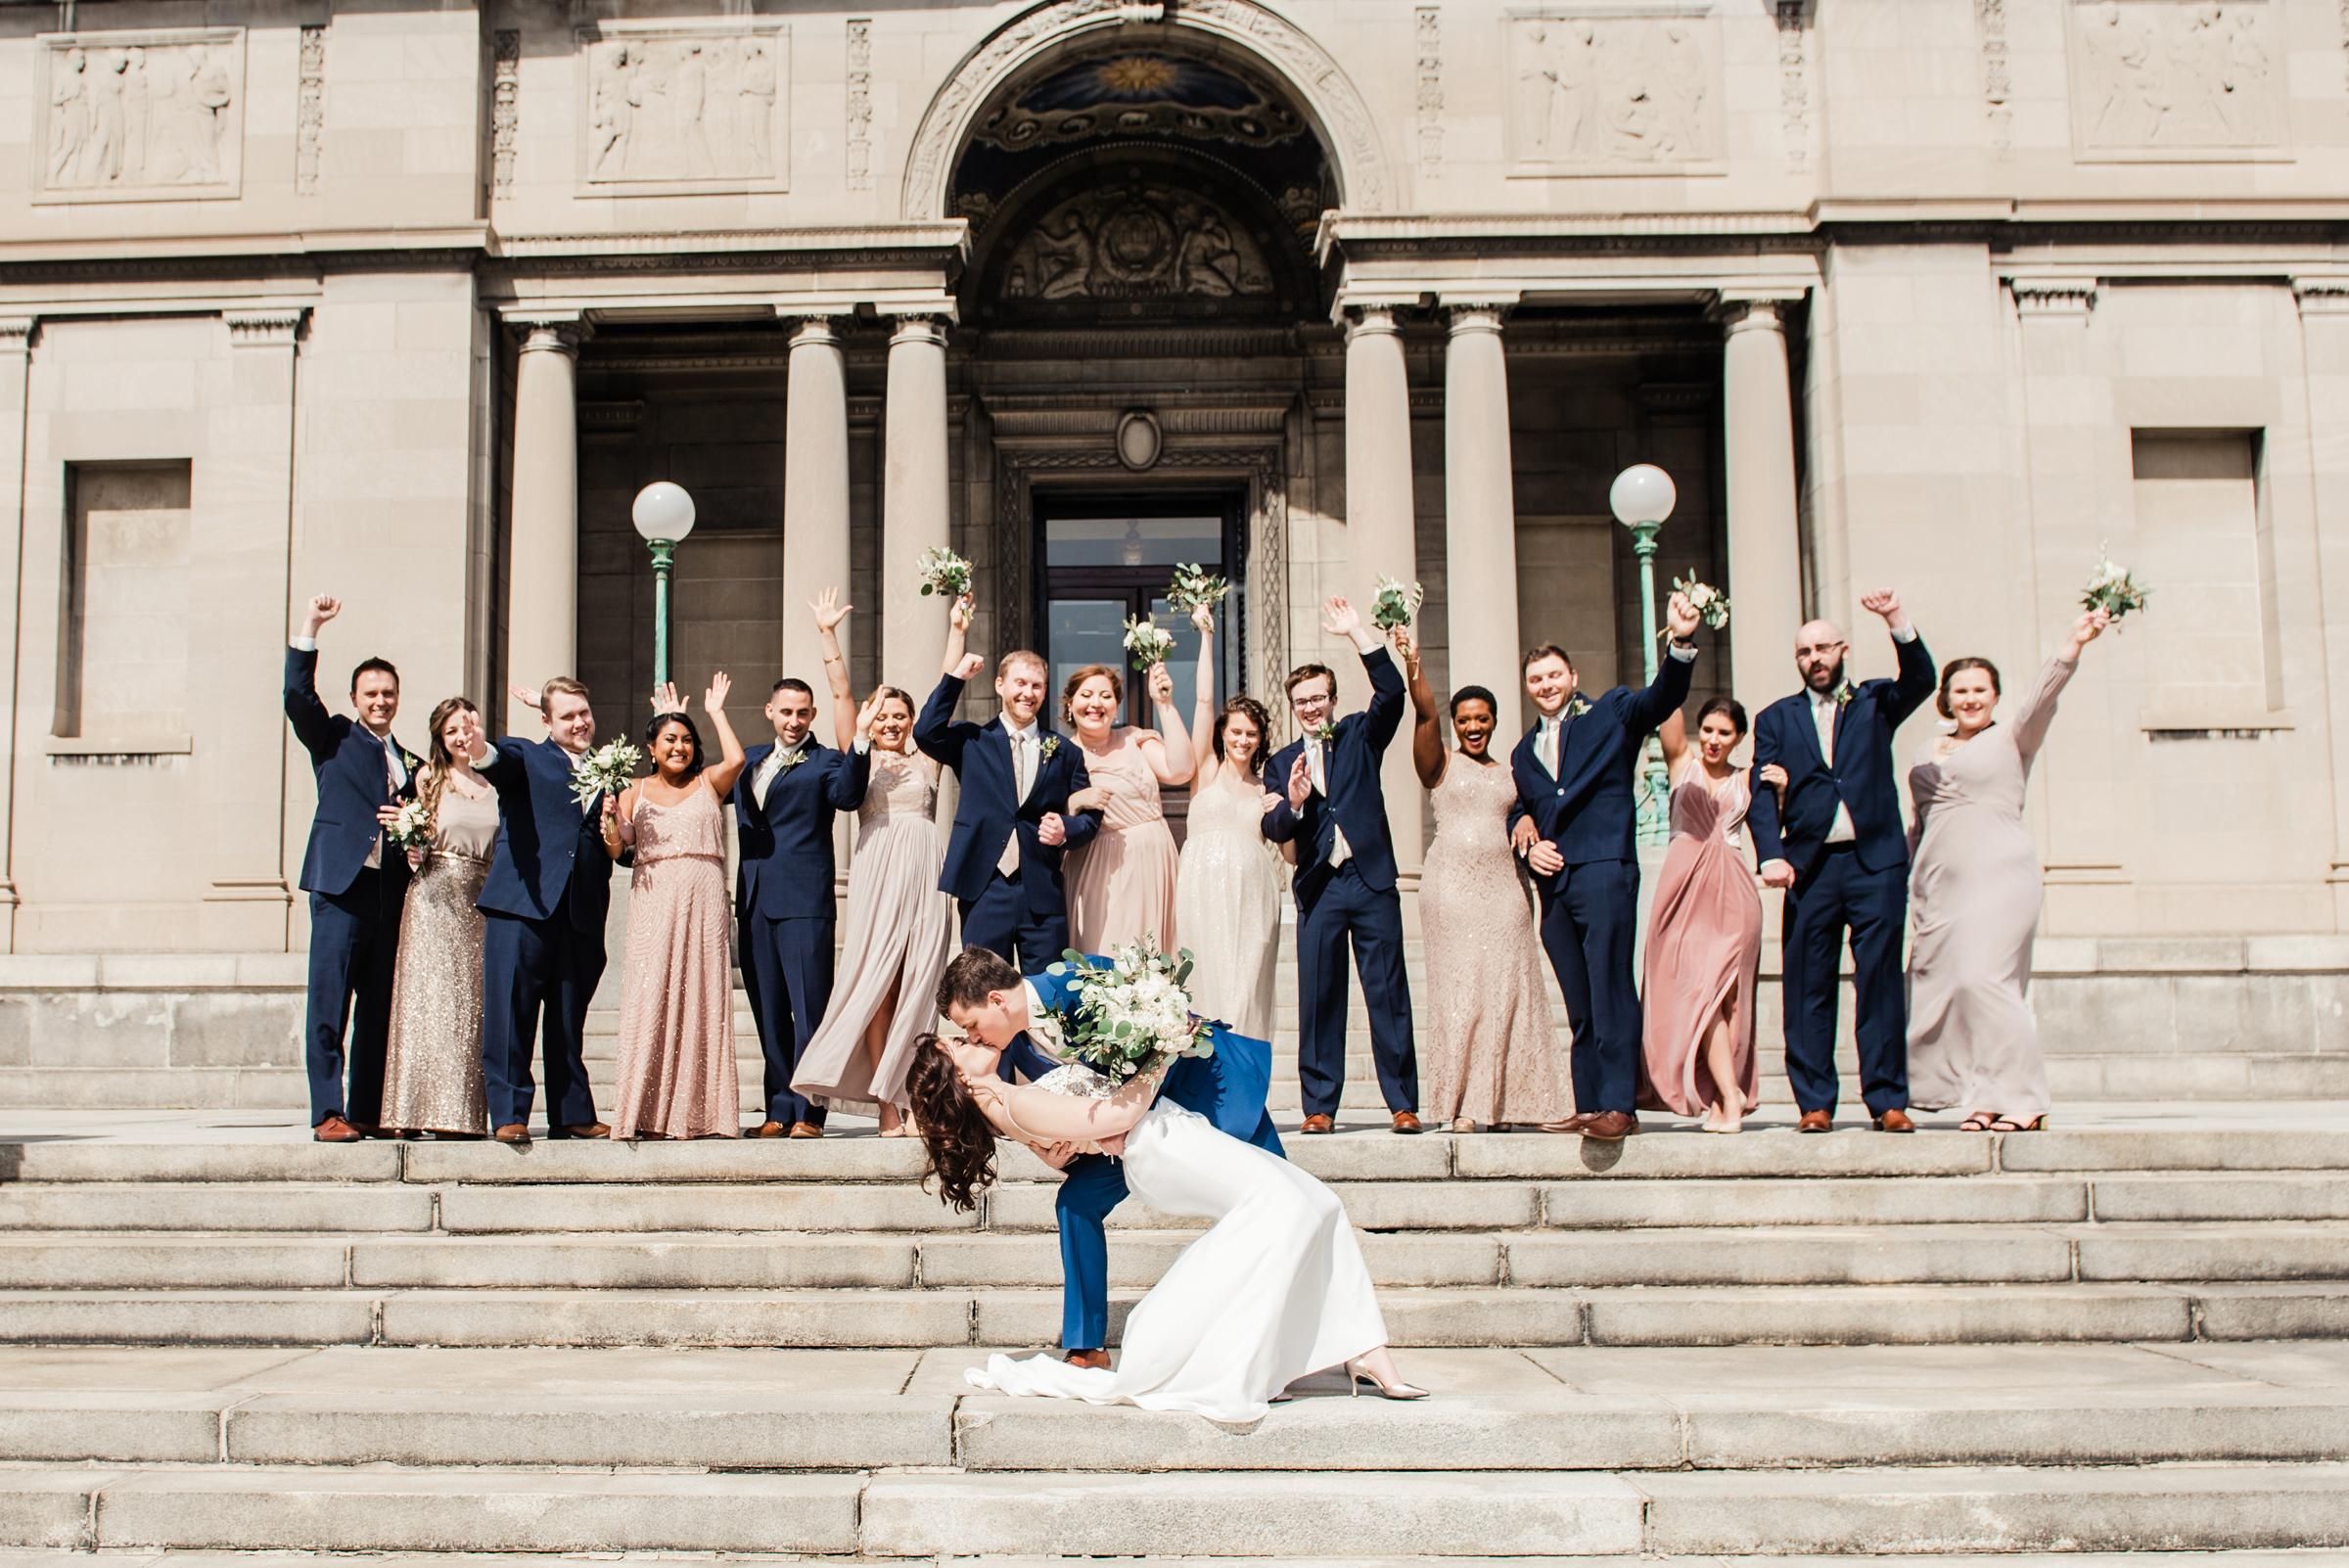 The_Arbor_LoftRochester_Wedding_JILL_STUDIO_Rochester_NY_Photographer_145632.jpg